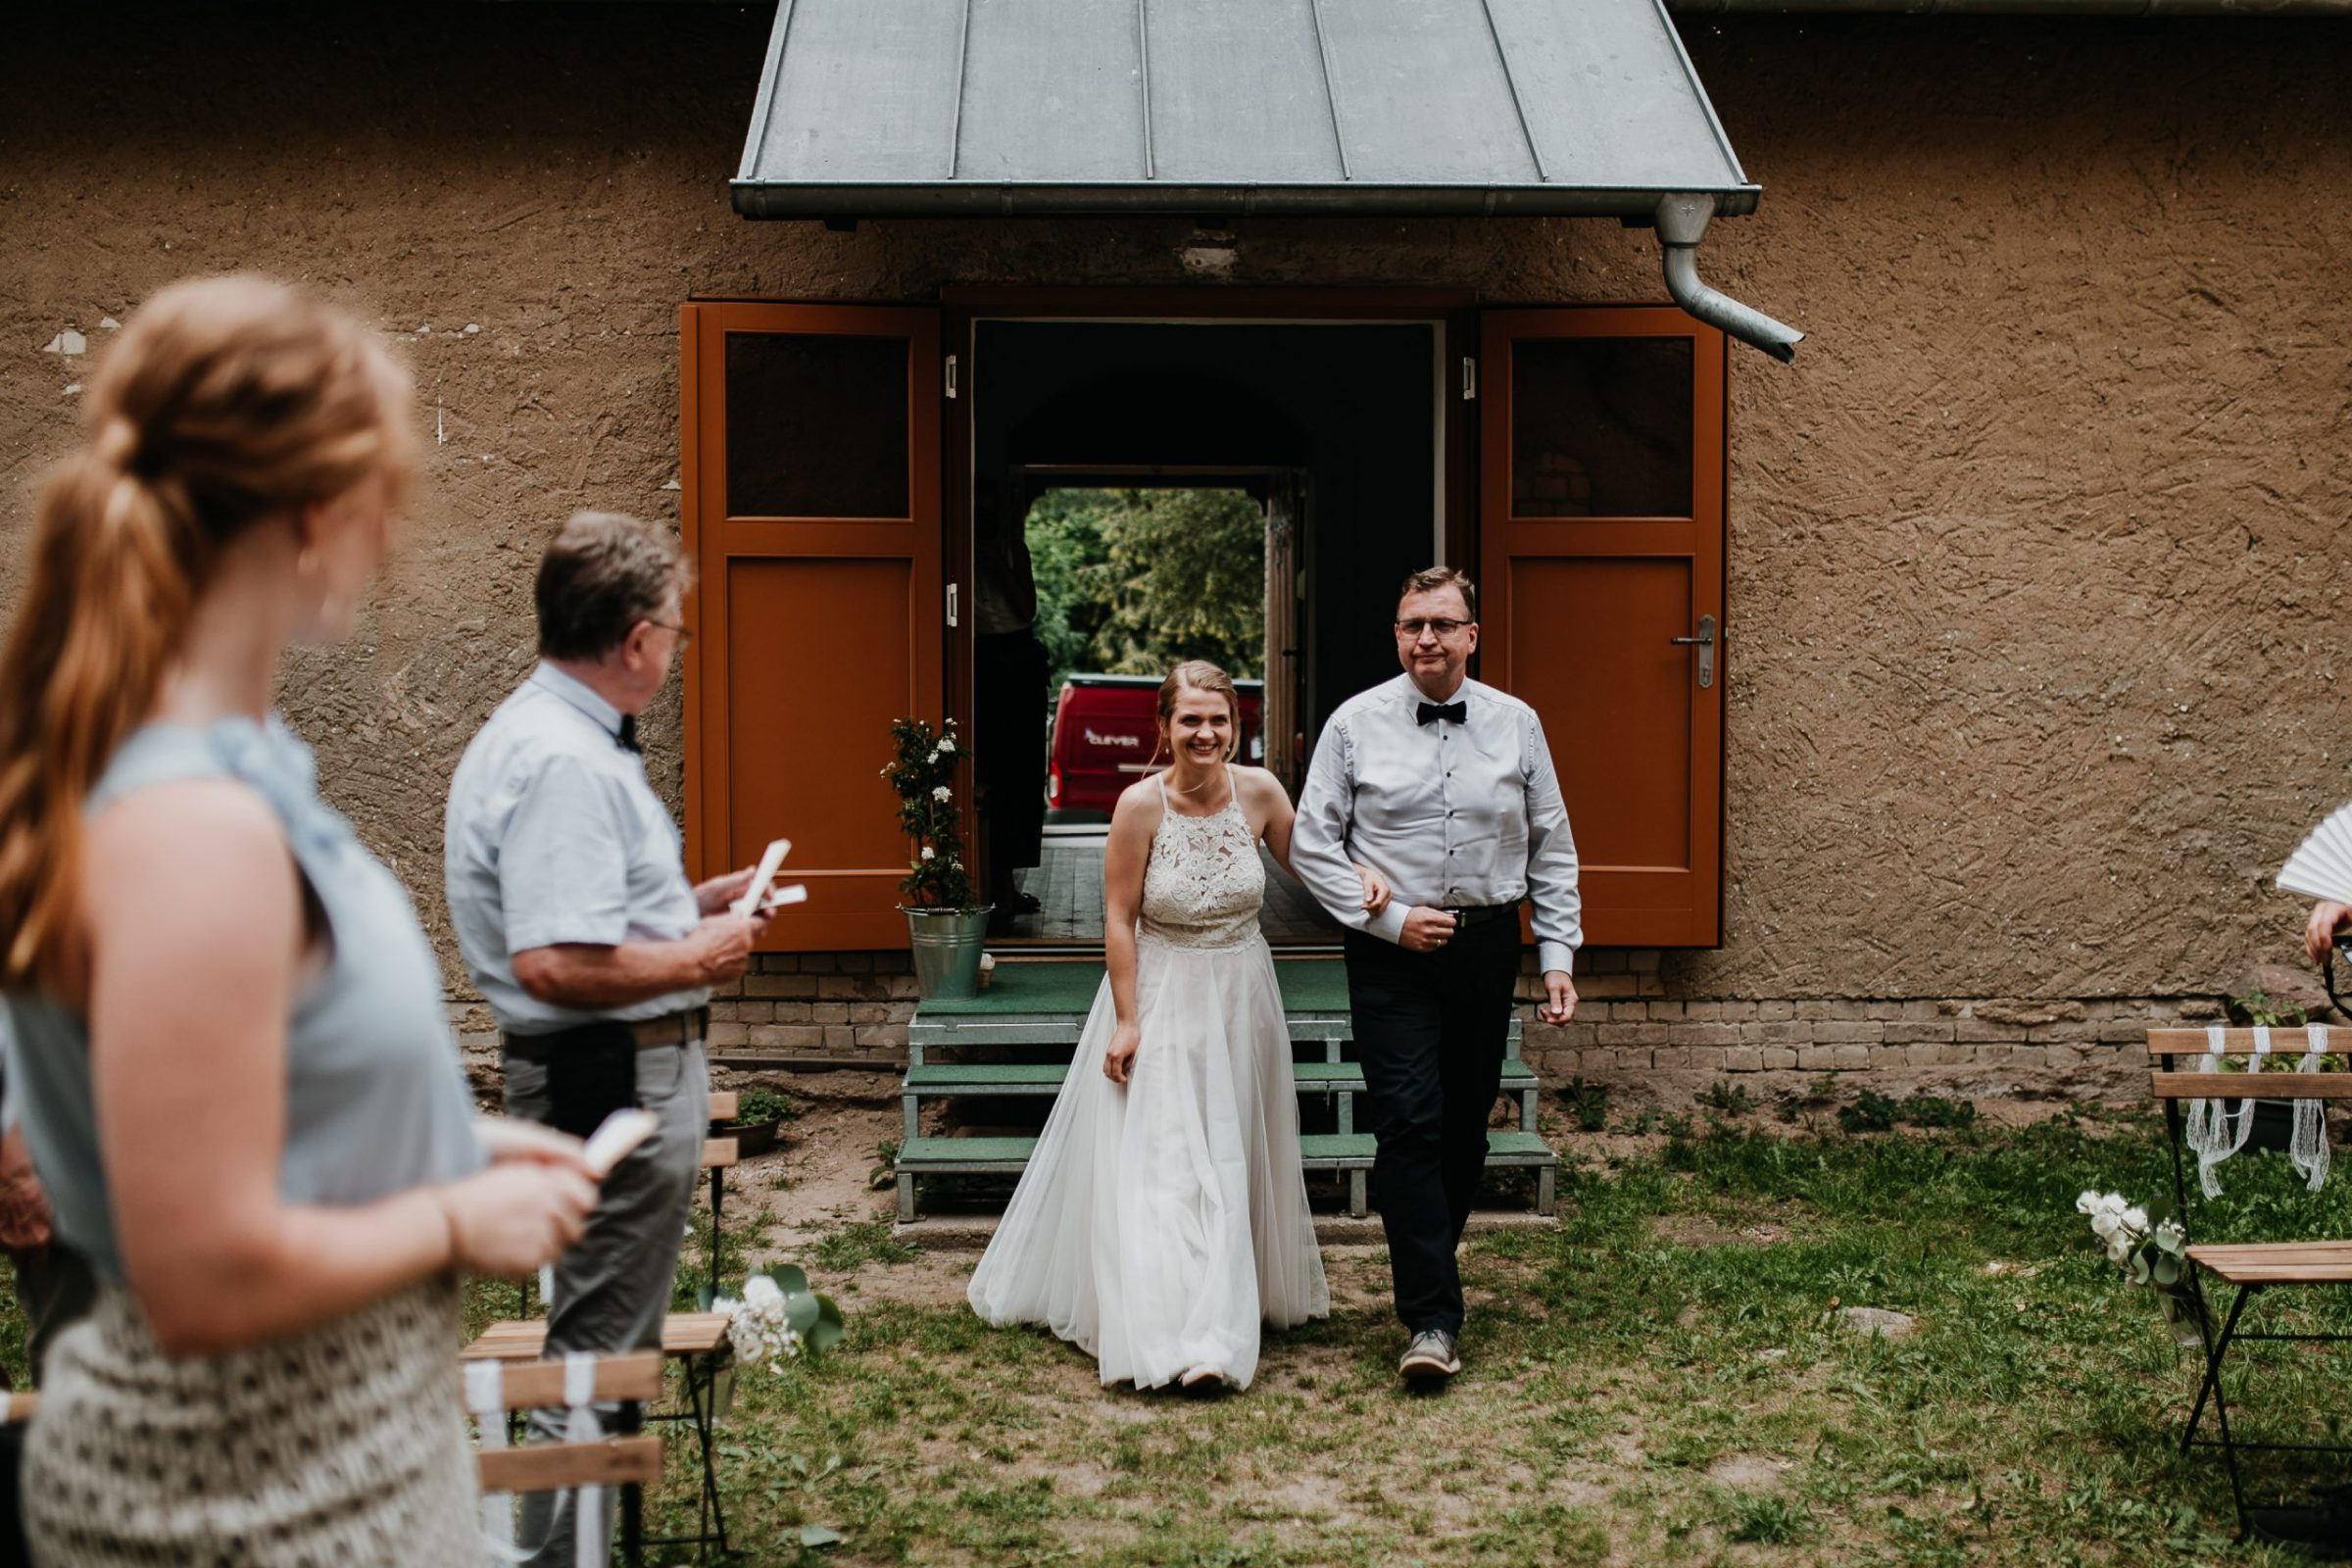 boho wedding, hochzeit berlin, braut, groom, bride, bräutigam, trauung, freie trauung, ceremony, father daughter, walking down the aisle